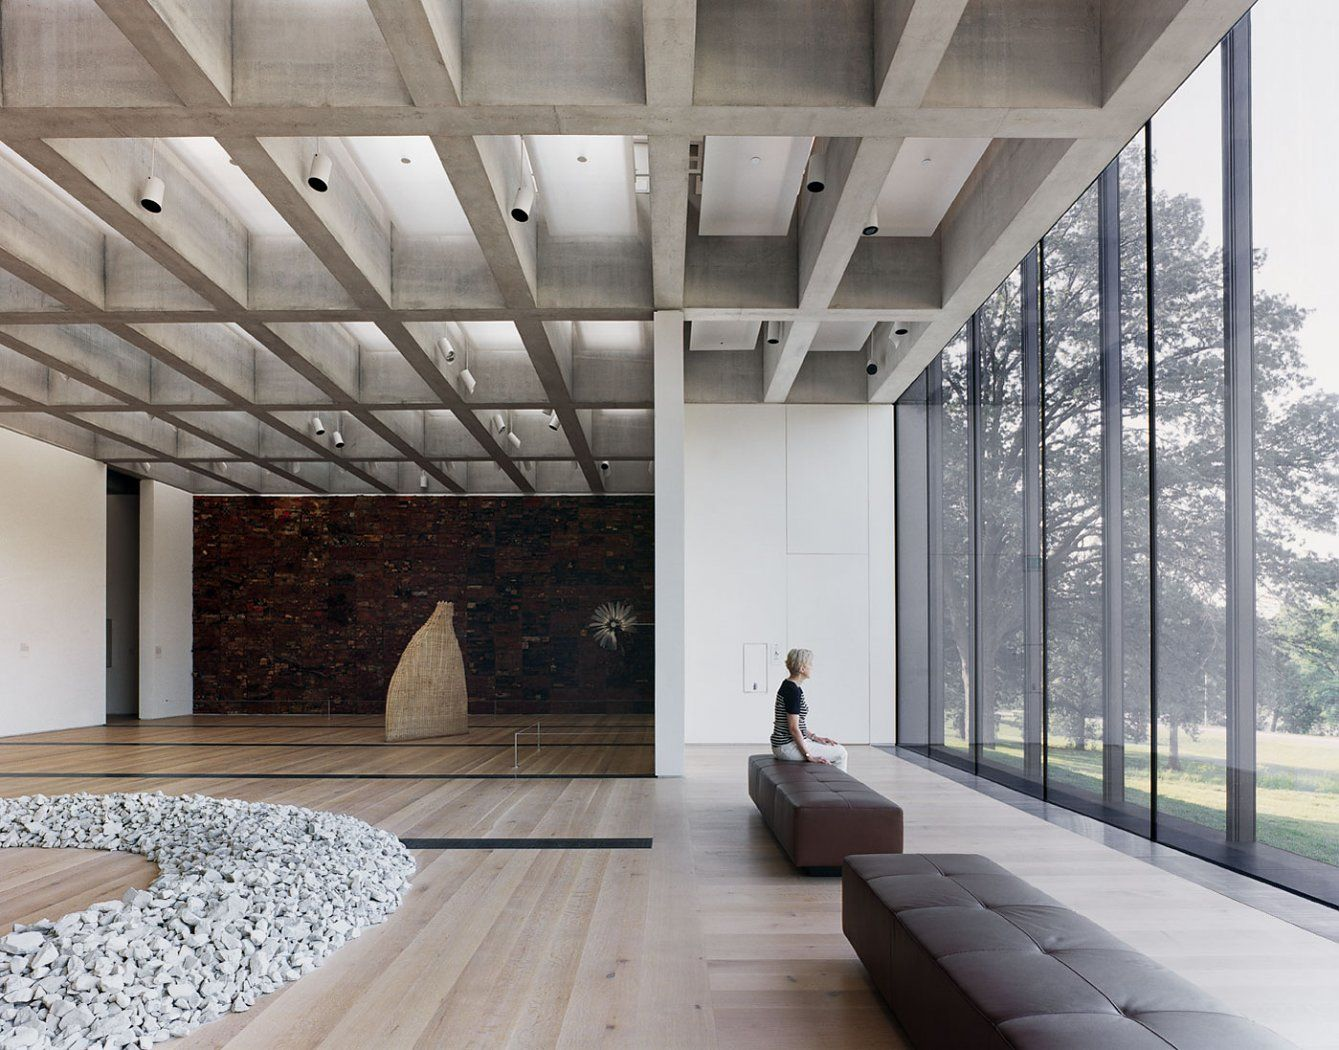 chipperfield st designer david top louis interior pin designers architects museum saint art